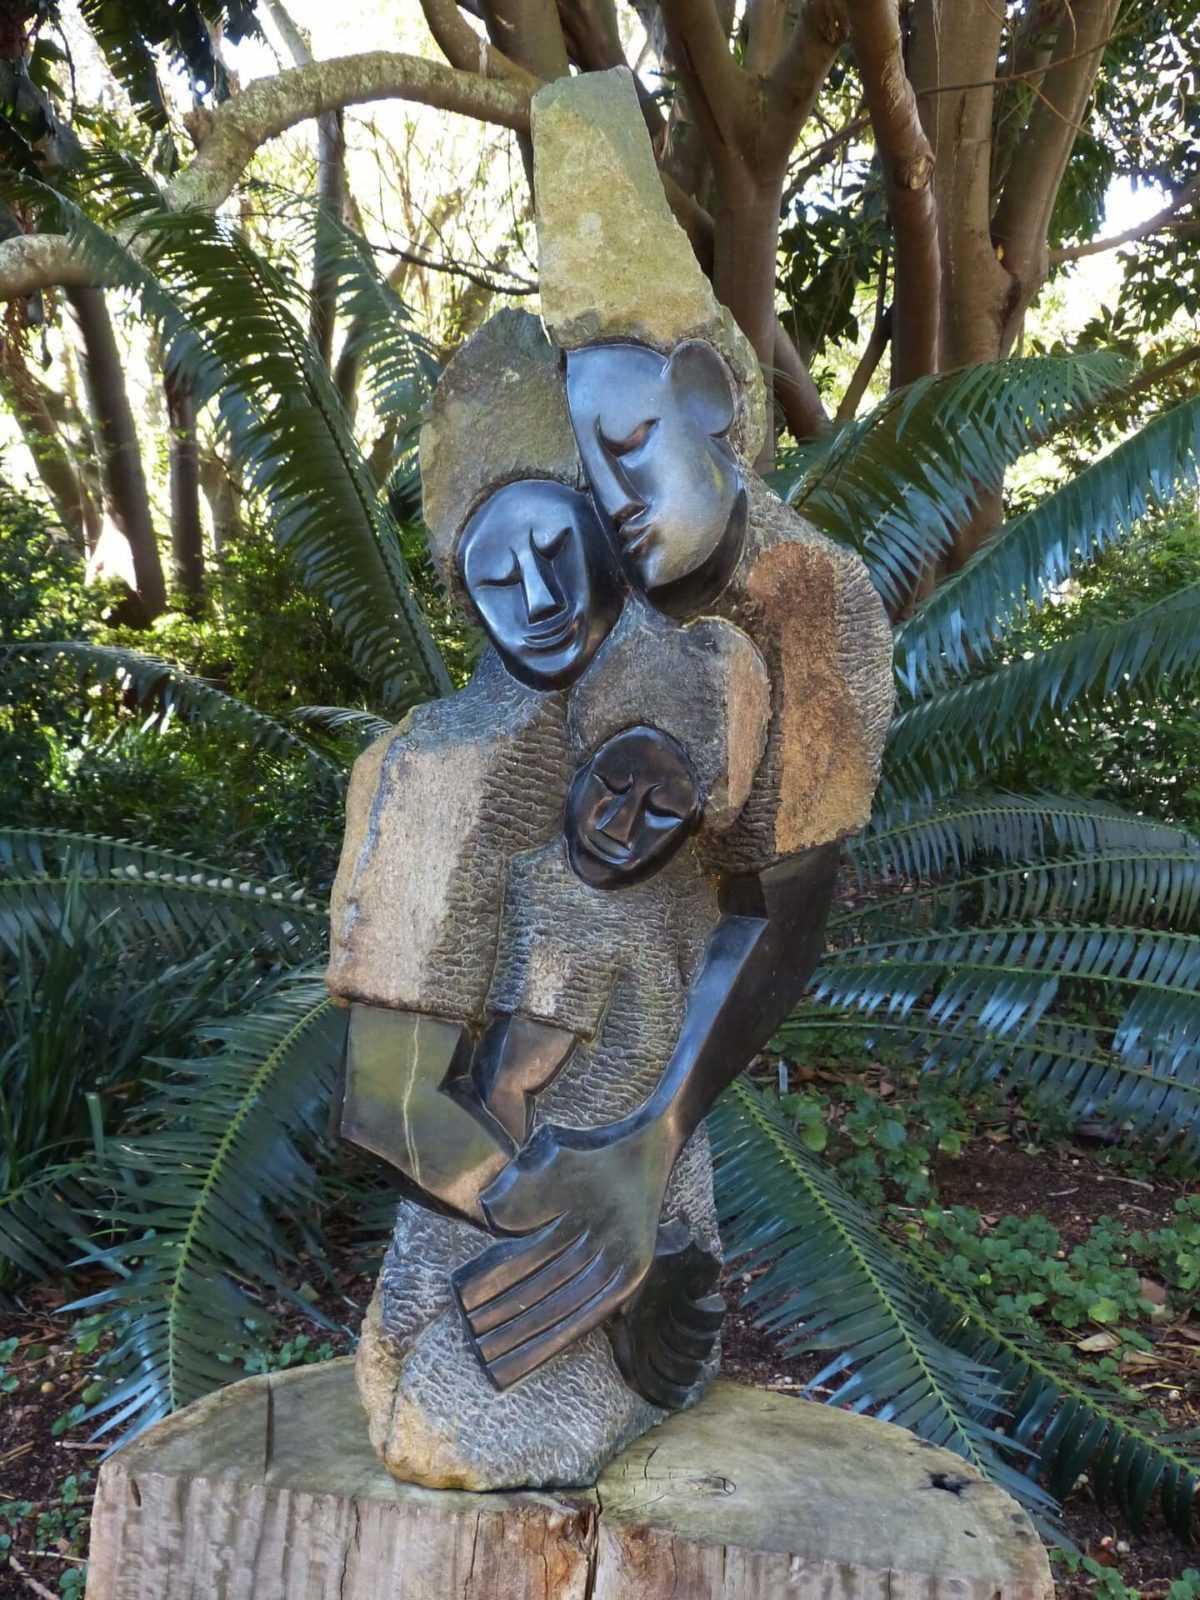 Things to do in Cape Town - Kirstenbosch Botanical Garden